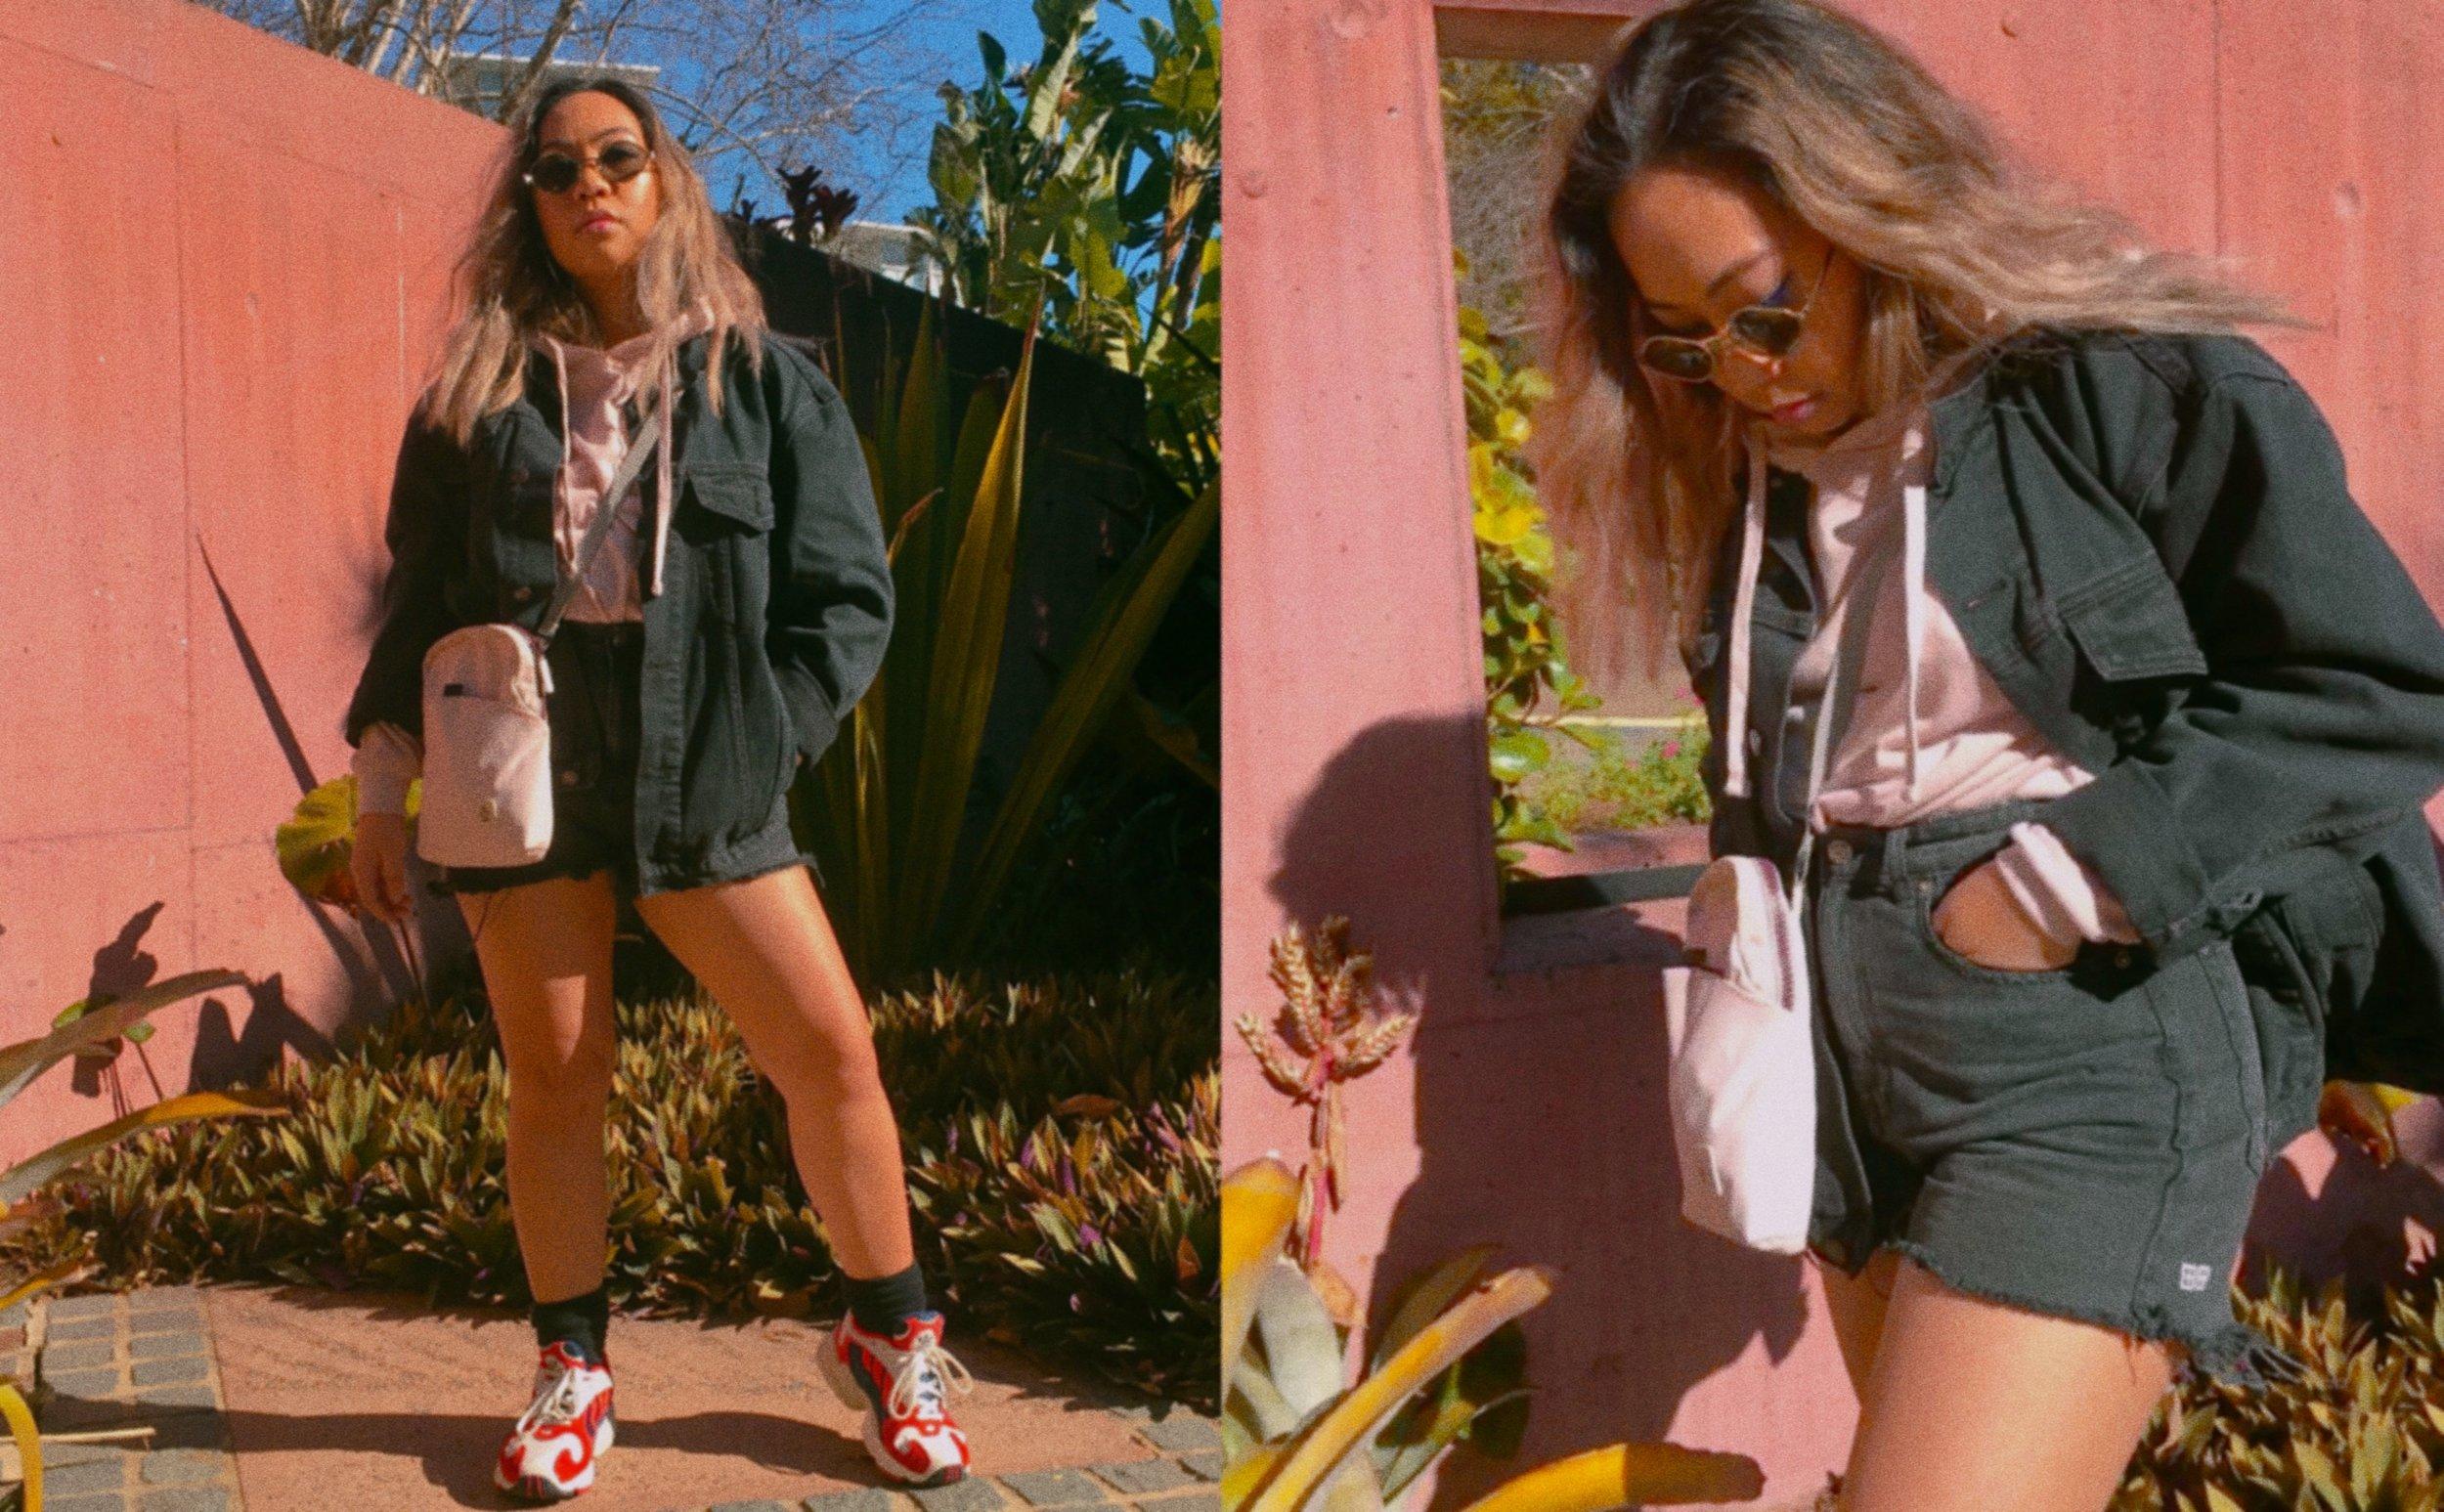 Jacket //  Princess Polly Phoenix Denim Jacket  Hoodie // Cotton On  (Similar Item)  Shorts //  Ksubi Rise n Hi Shorts in Storm  Side Bag // Crumpler  (Similar Item)  Sunnies //  Quay Purple Honey